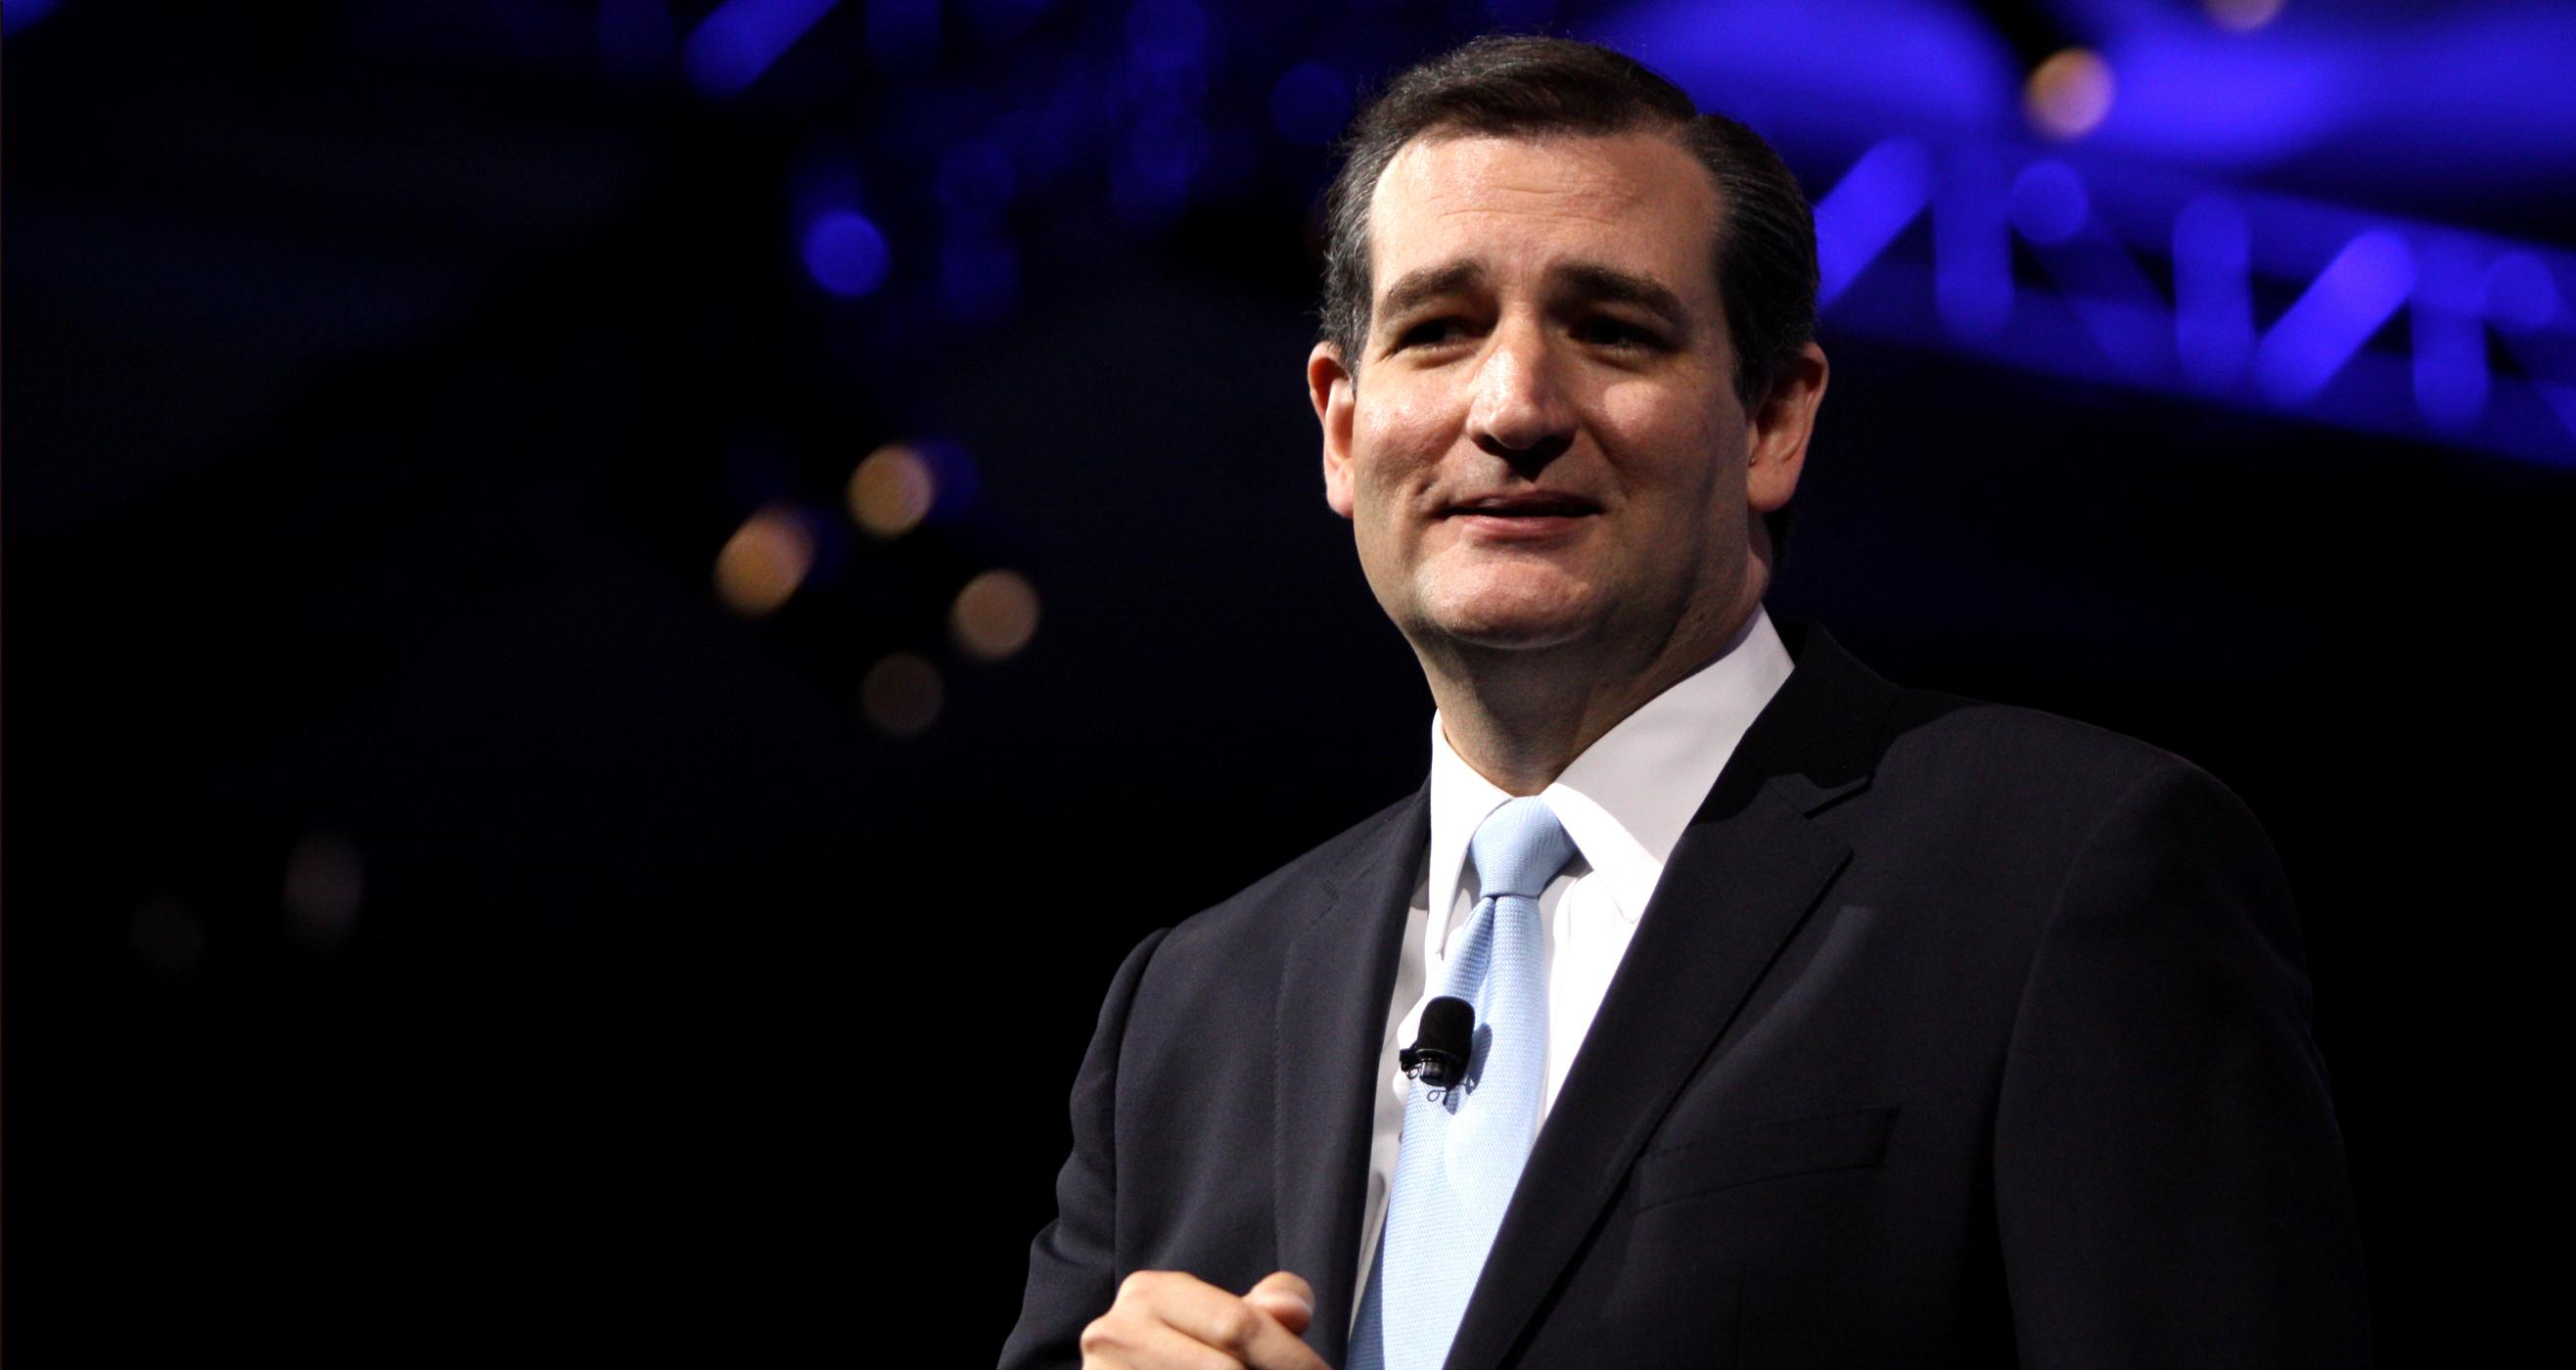 Ted Cruz Annihilated On Social Media For Making Joe Biden Joke After Son Beau's Death